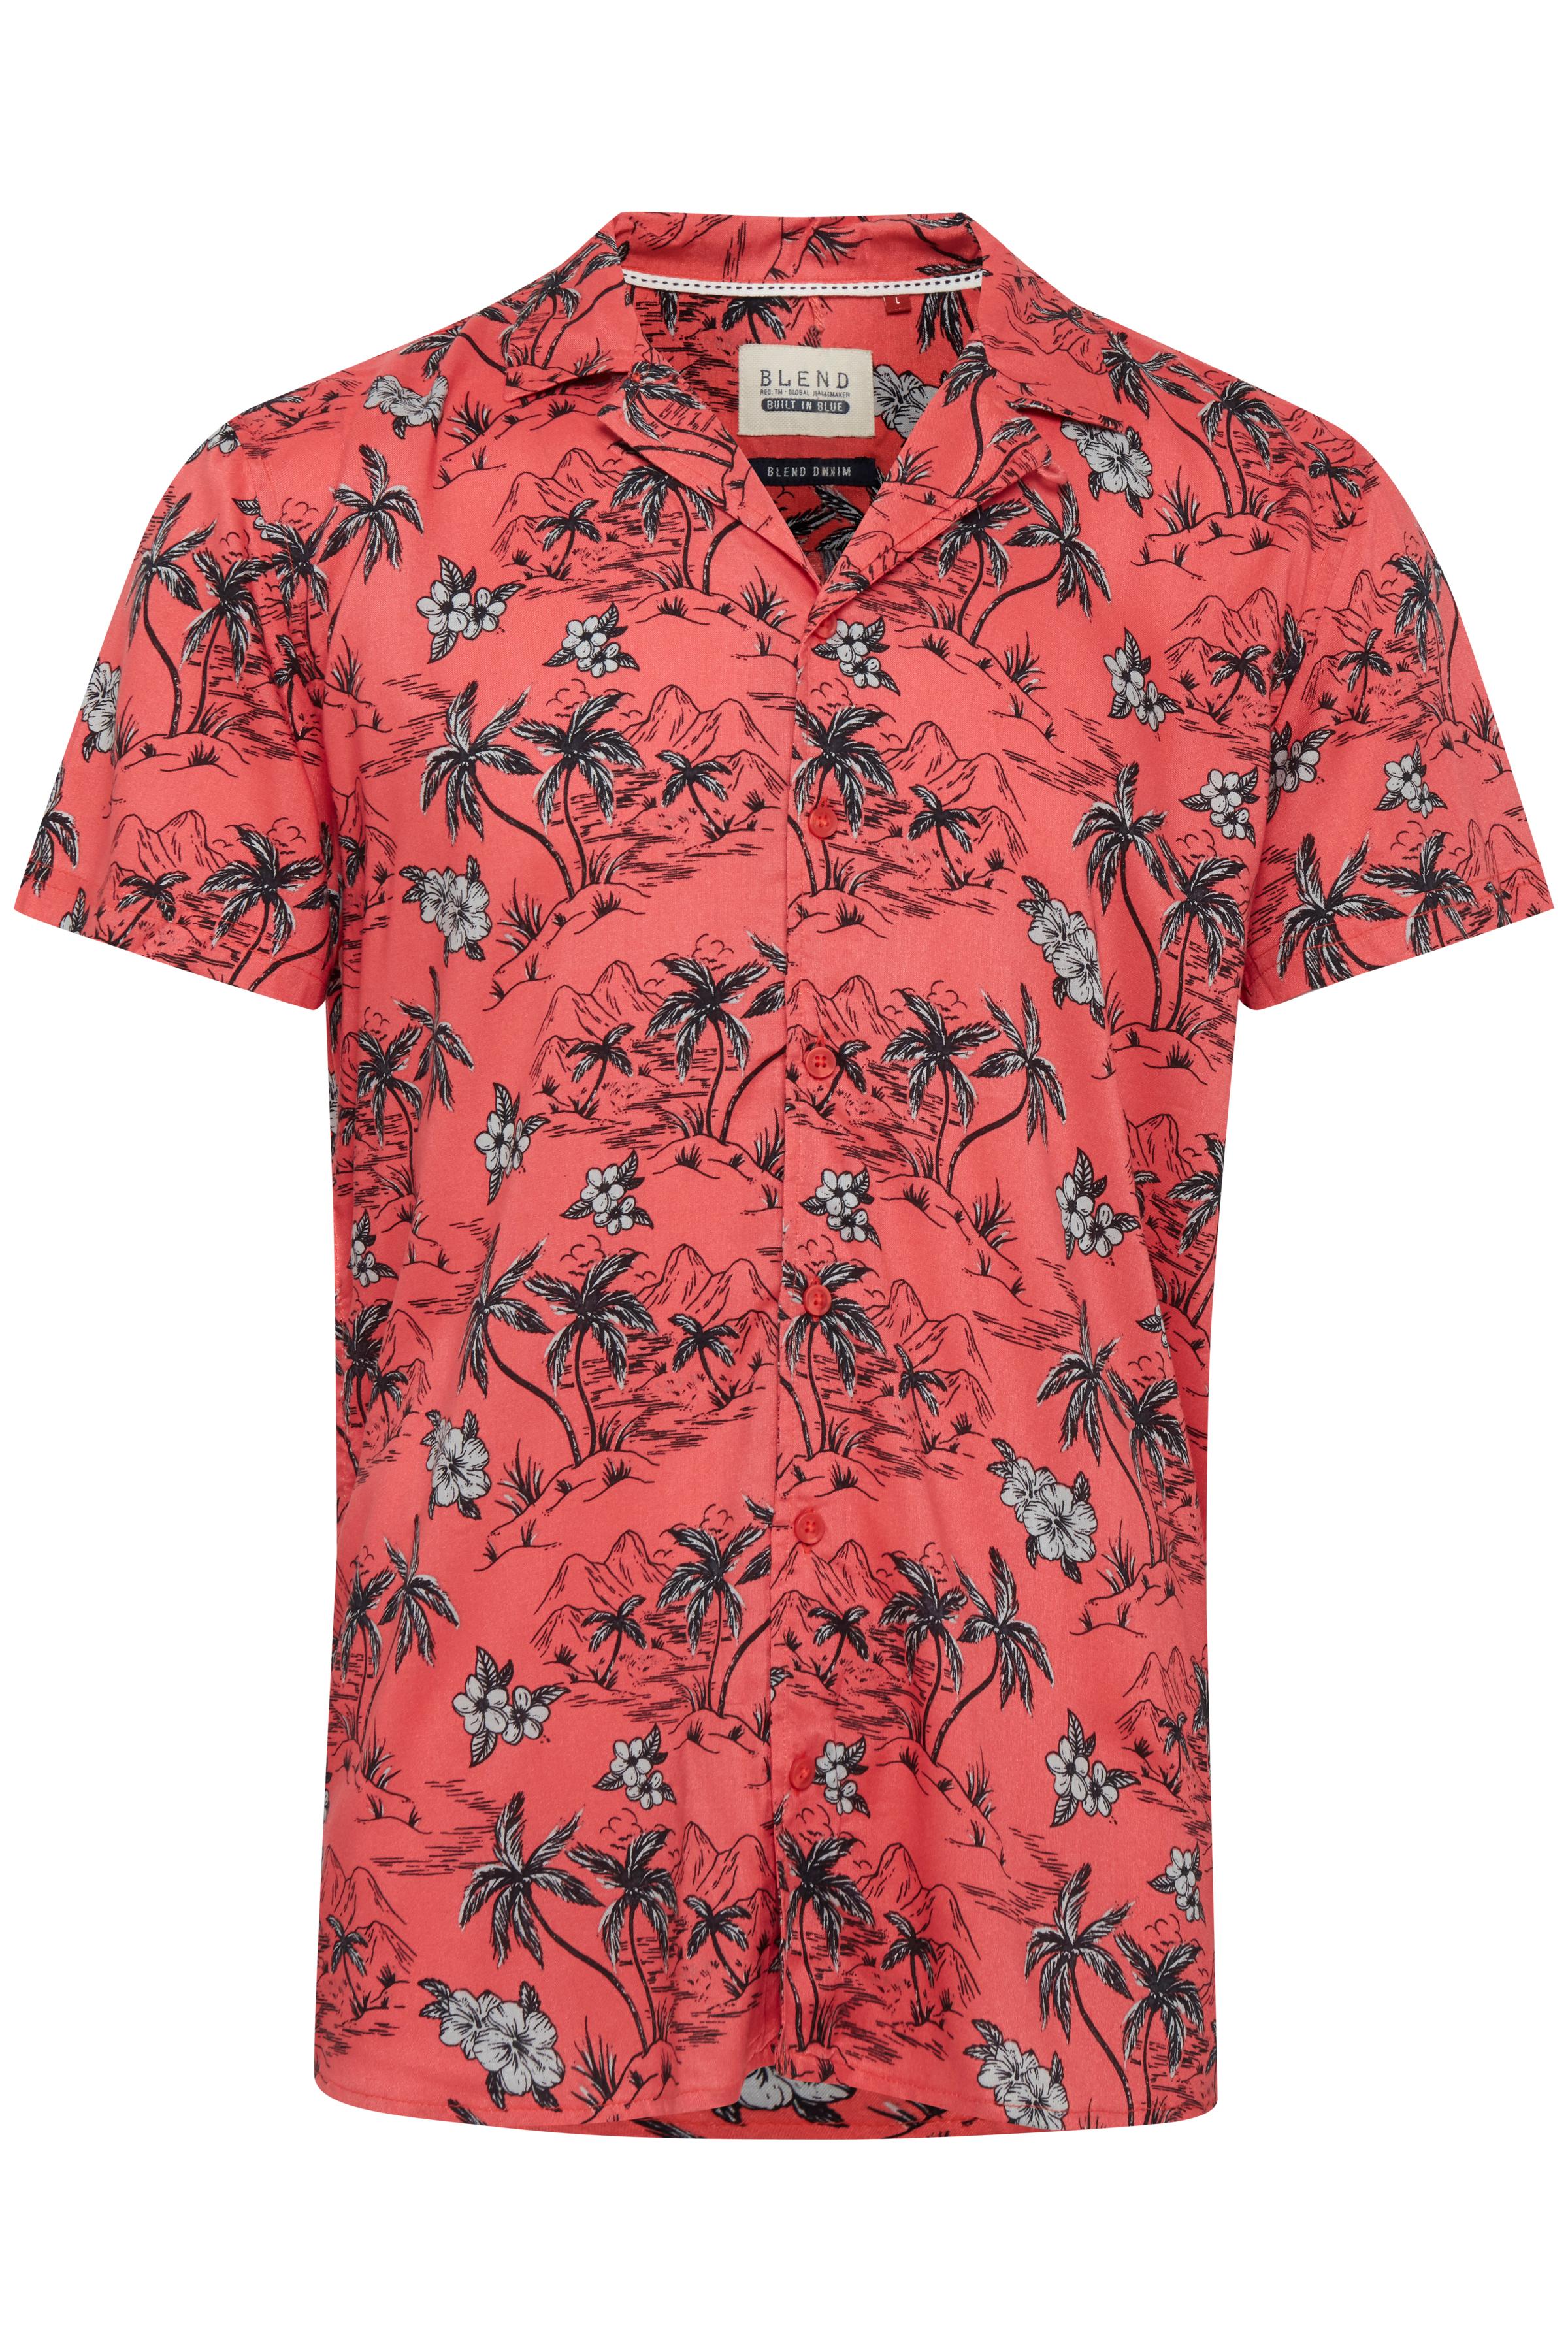 Cayenne Skjorte – Køb Cayenne Skjorte fra str. S-XL her